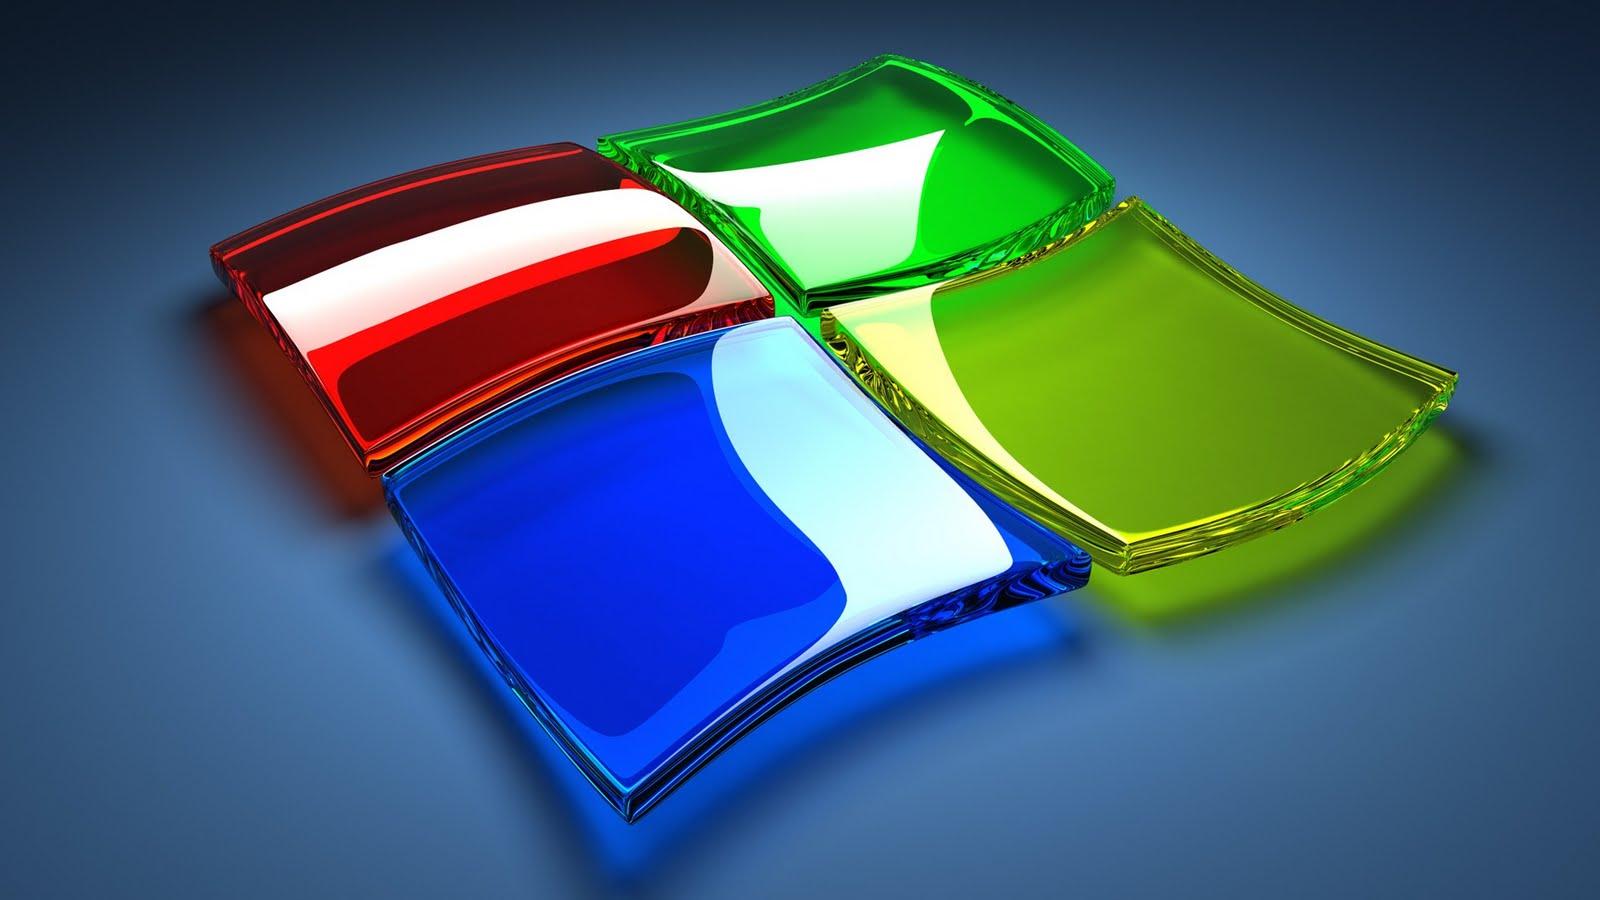 http://2.bp.blogspot.com/-vtqyucv2bjY/TeQF1AUDf-I/AAAAAAAAADI/i3VVFOiWlvU/s1600/3D_Windows_7_1920x1080-HDTV-1080p.jpg